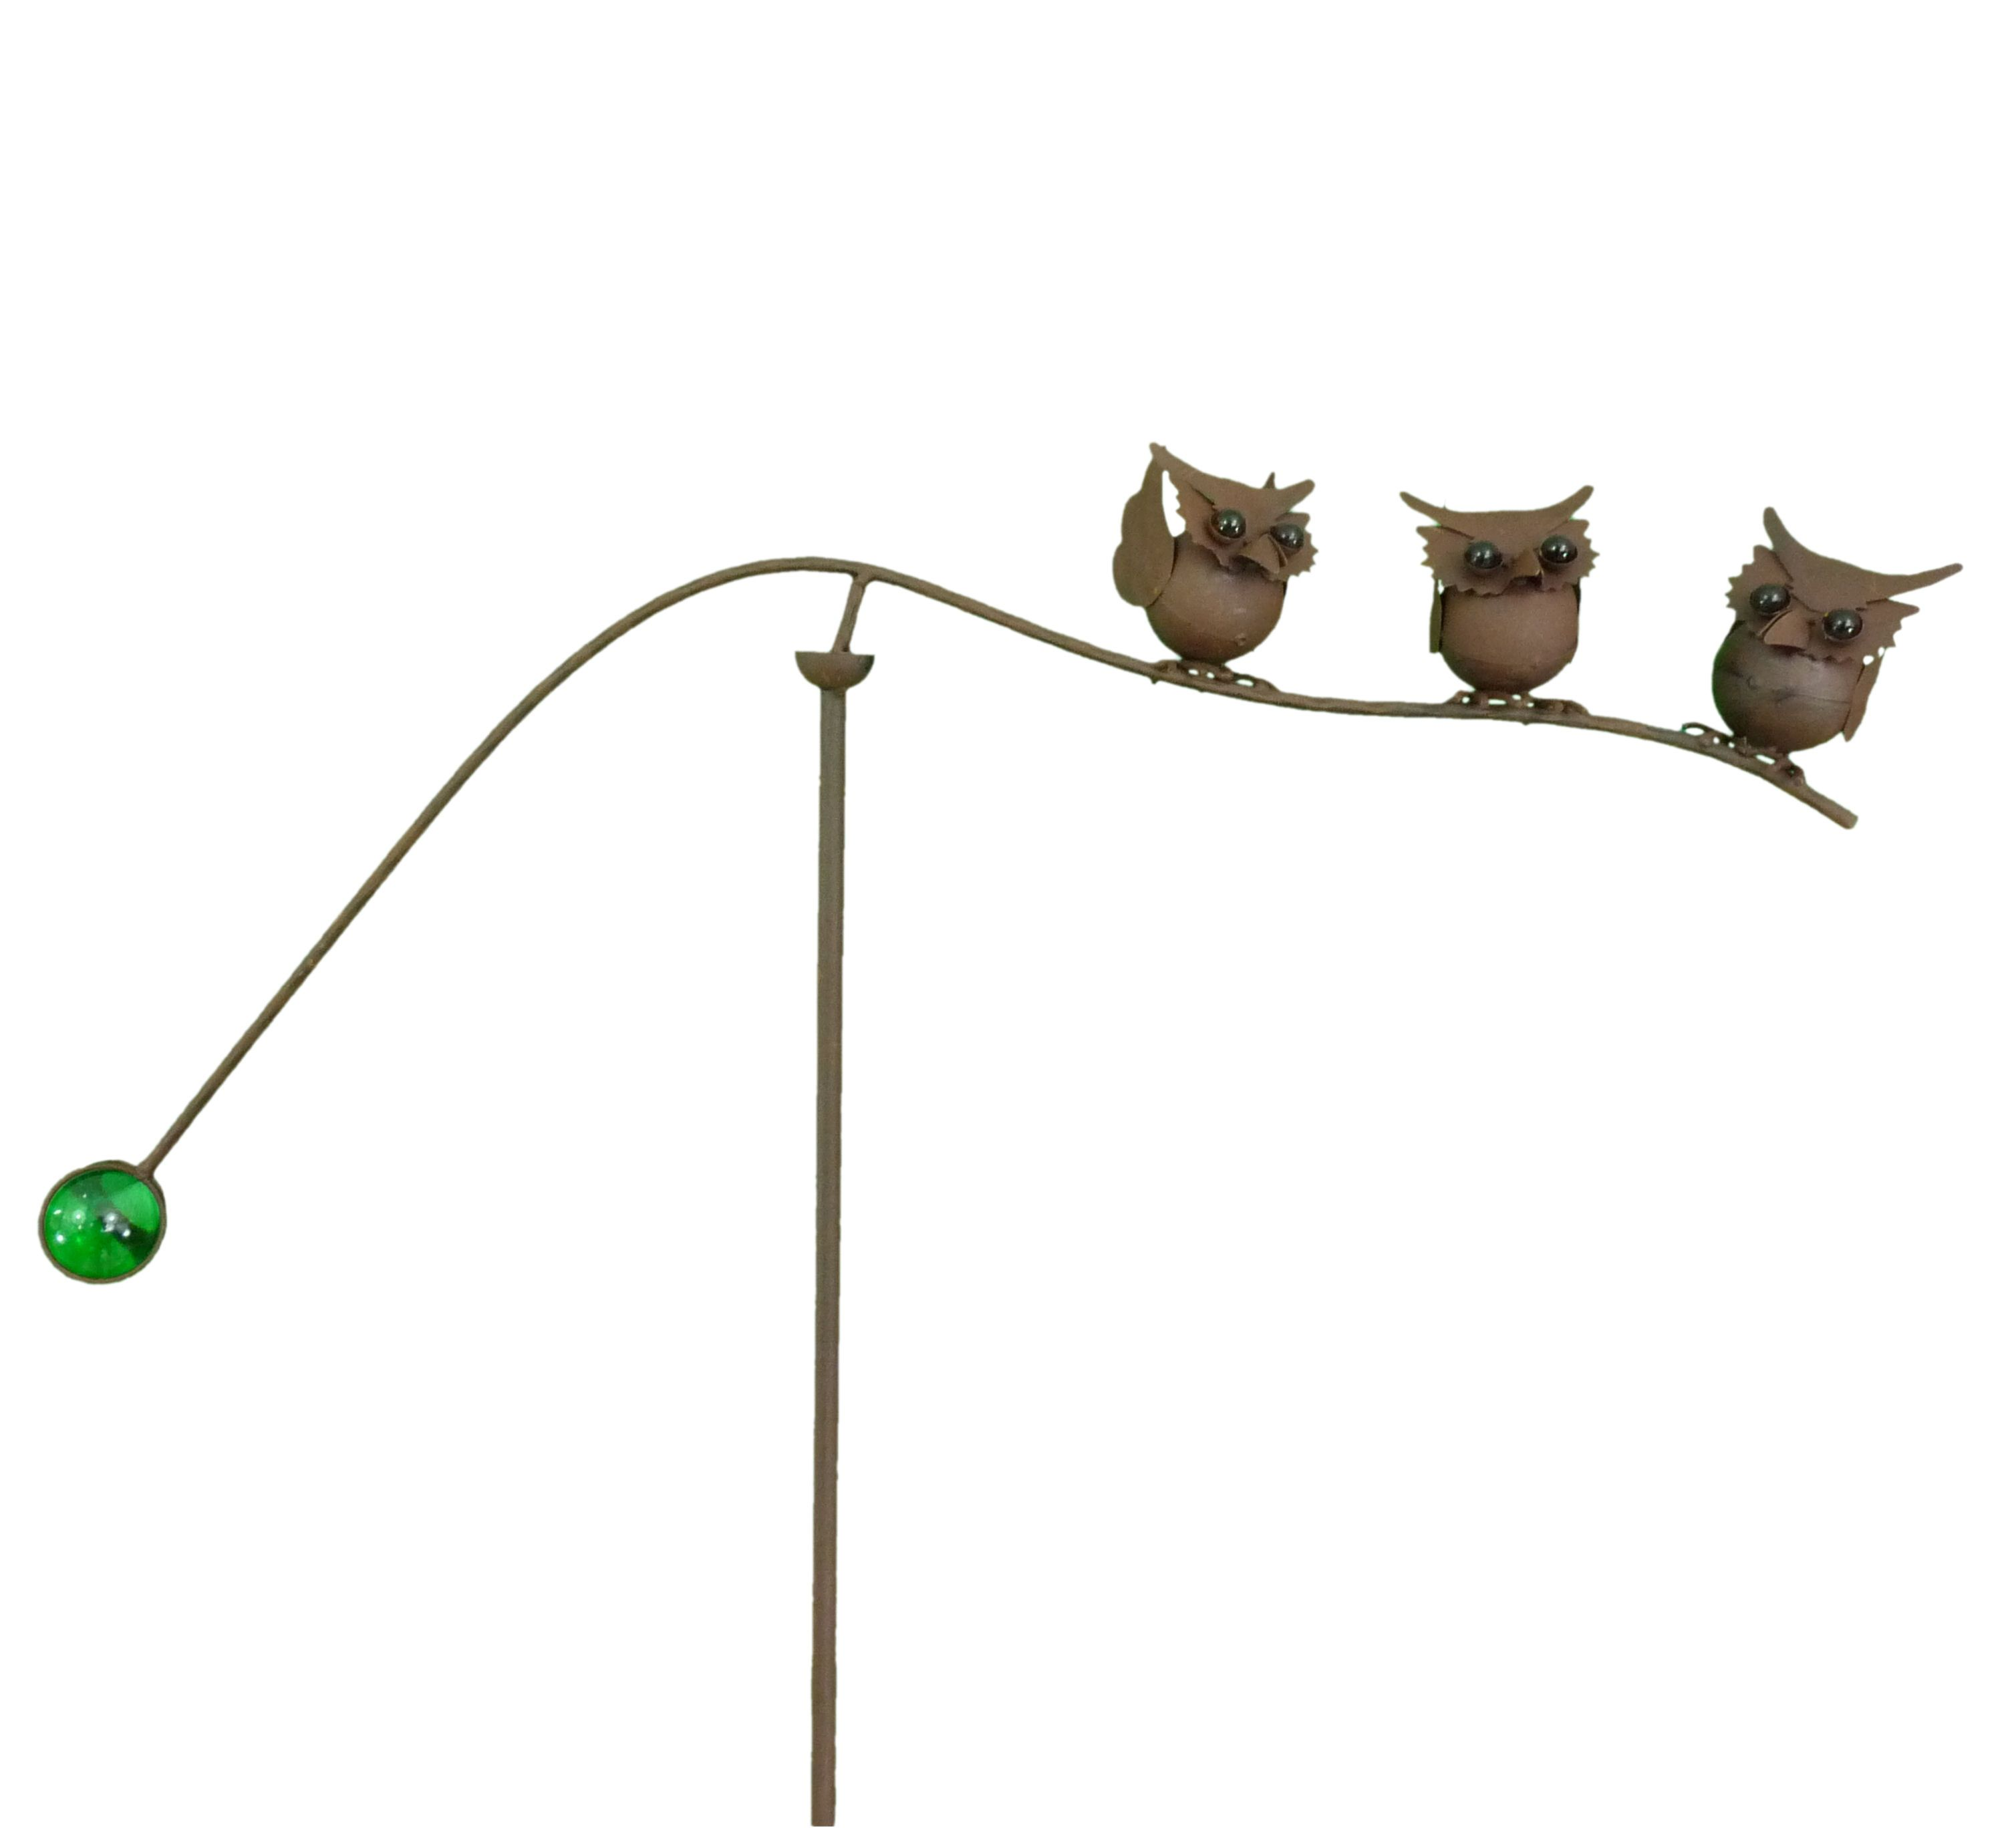 Beautiful Spinning Balancing Trio Of Owls Metal Garden Wind Spinner Ornament Animal